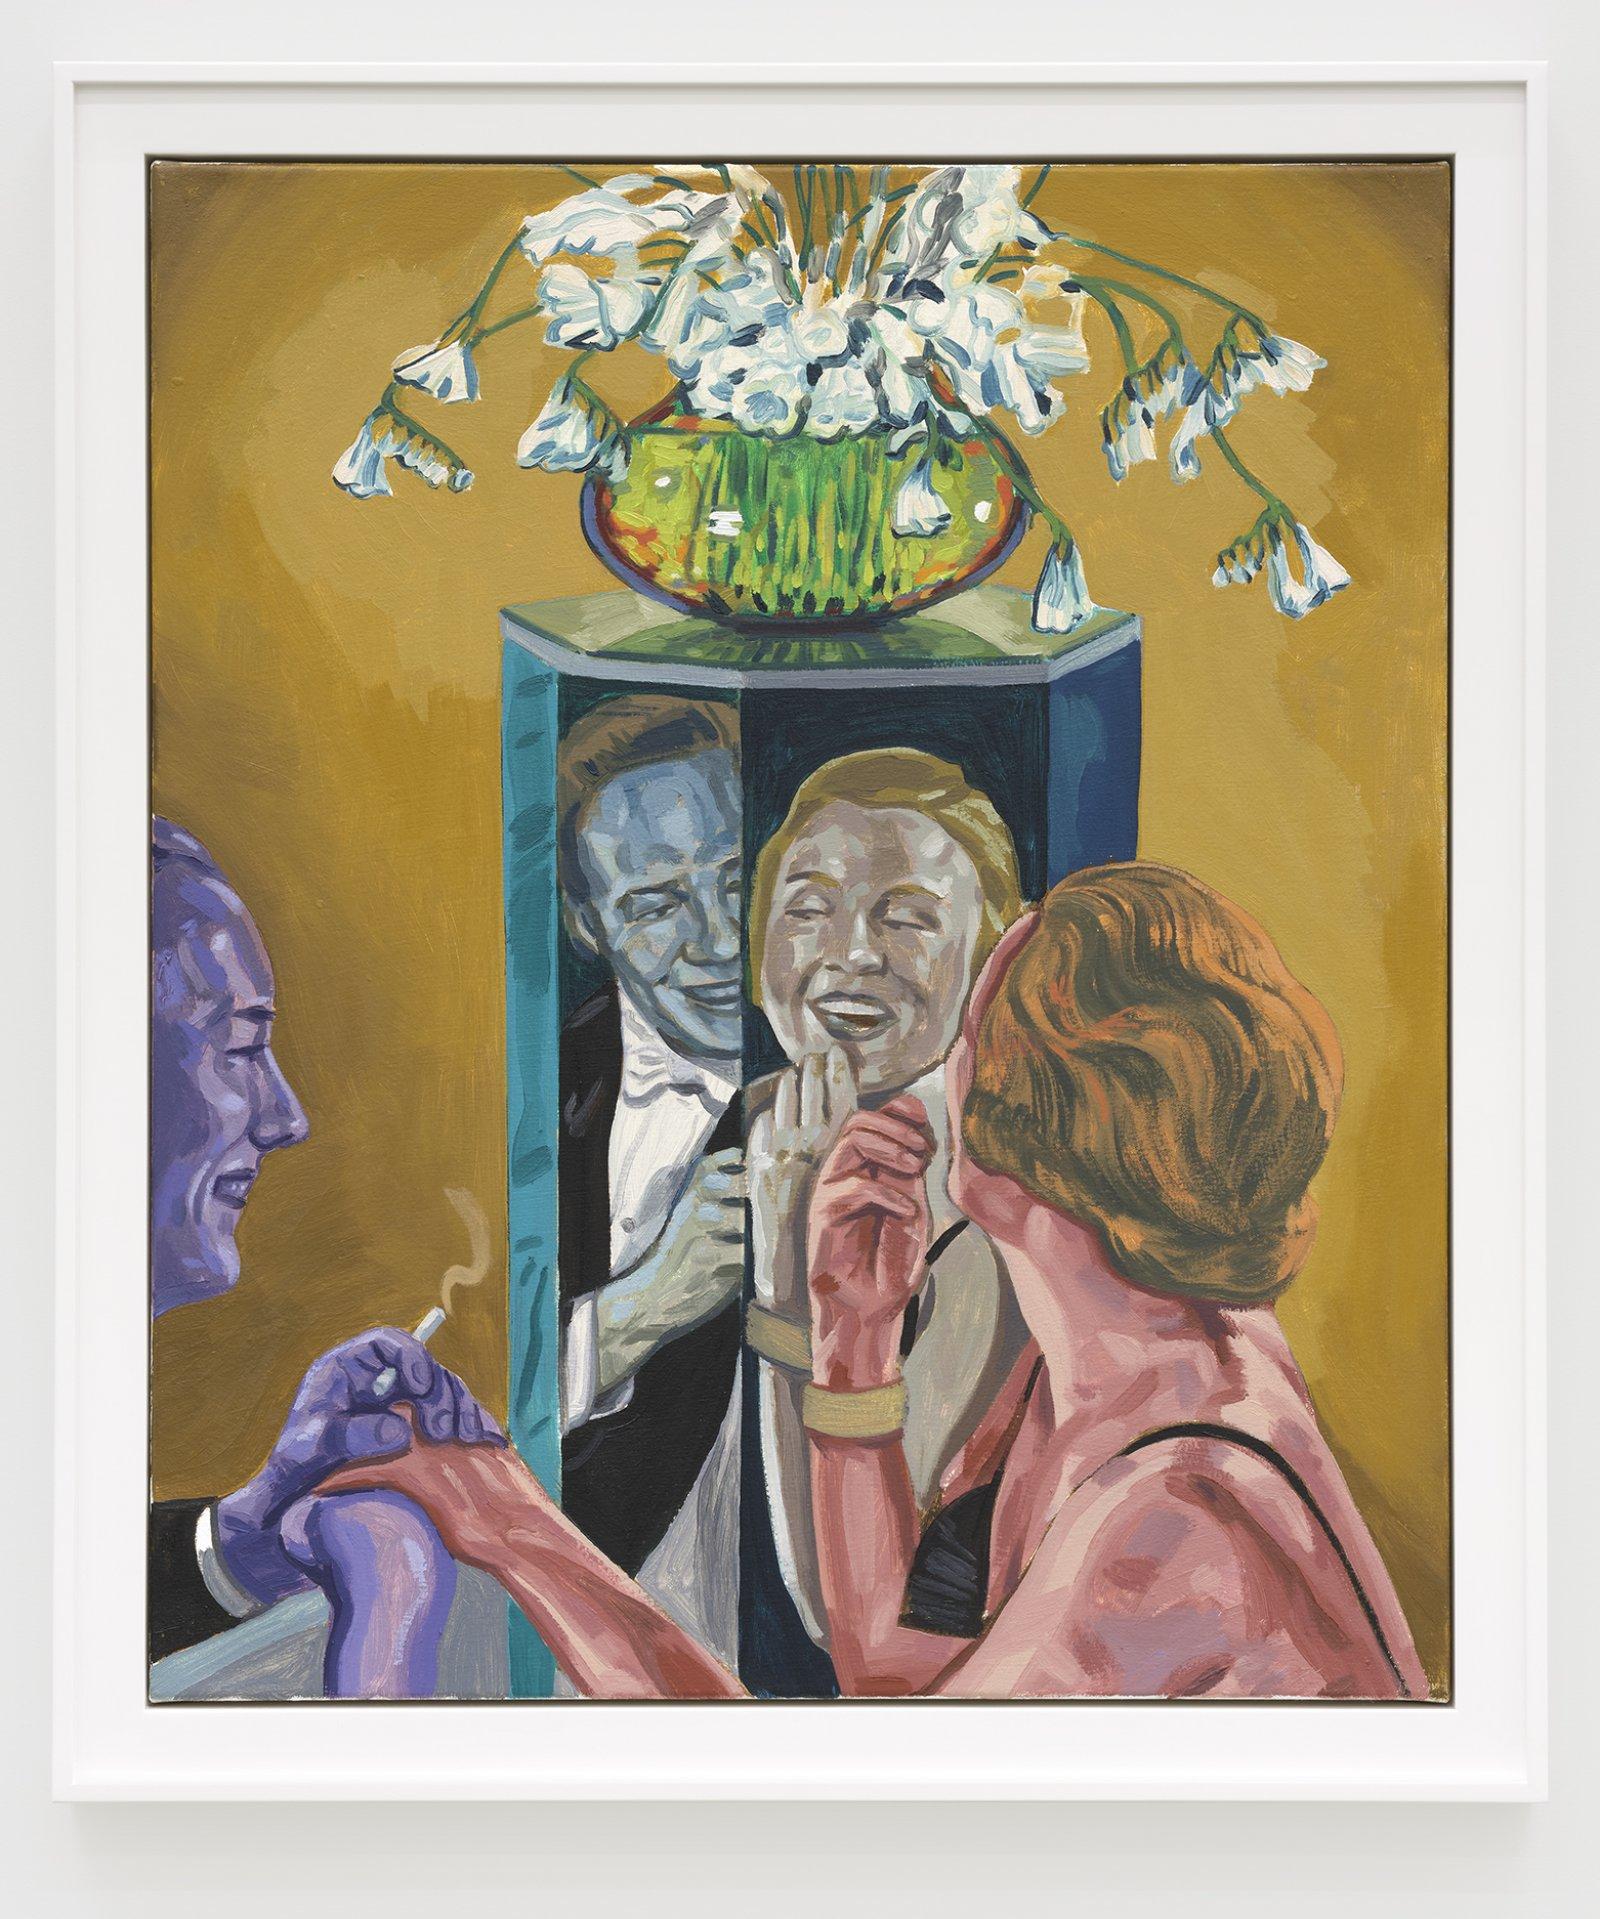 Damian Moppett, Man and Woman in Mirror, 2020, oil on canvas, 36 x 31 in. (92 x 79 cm) by Damian Moppett